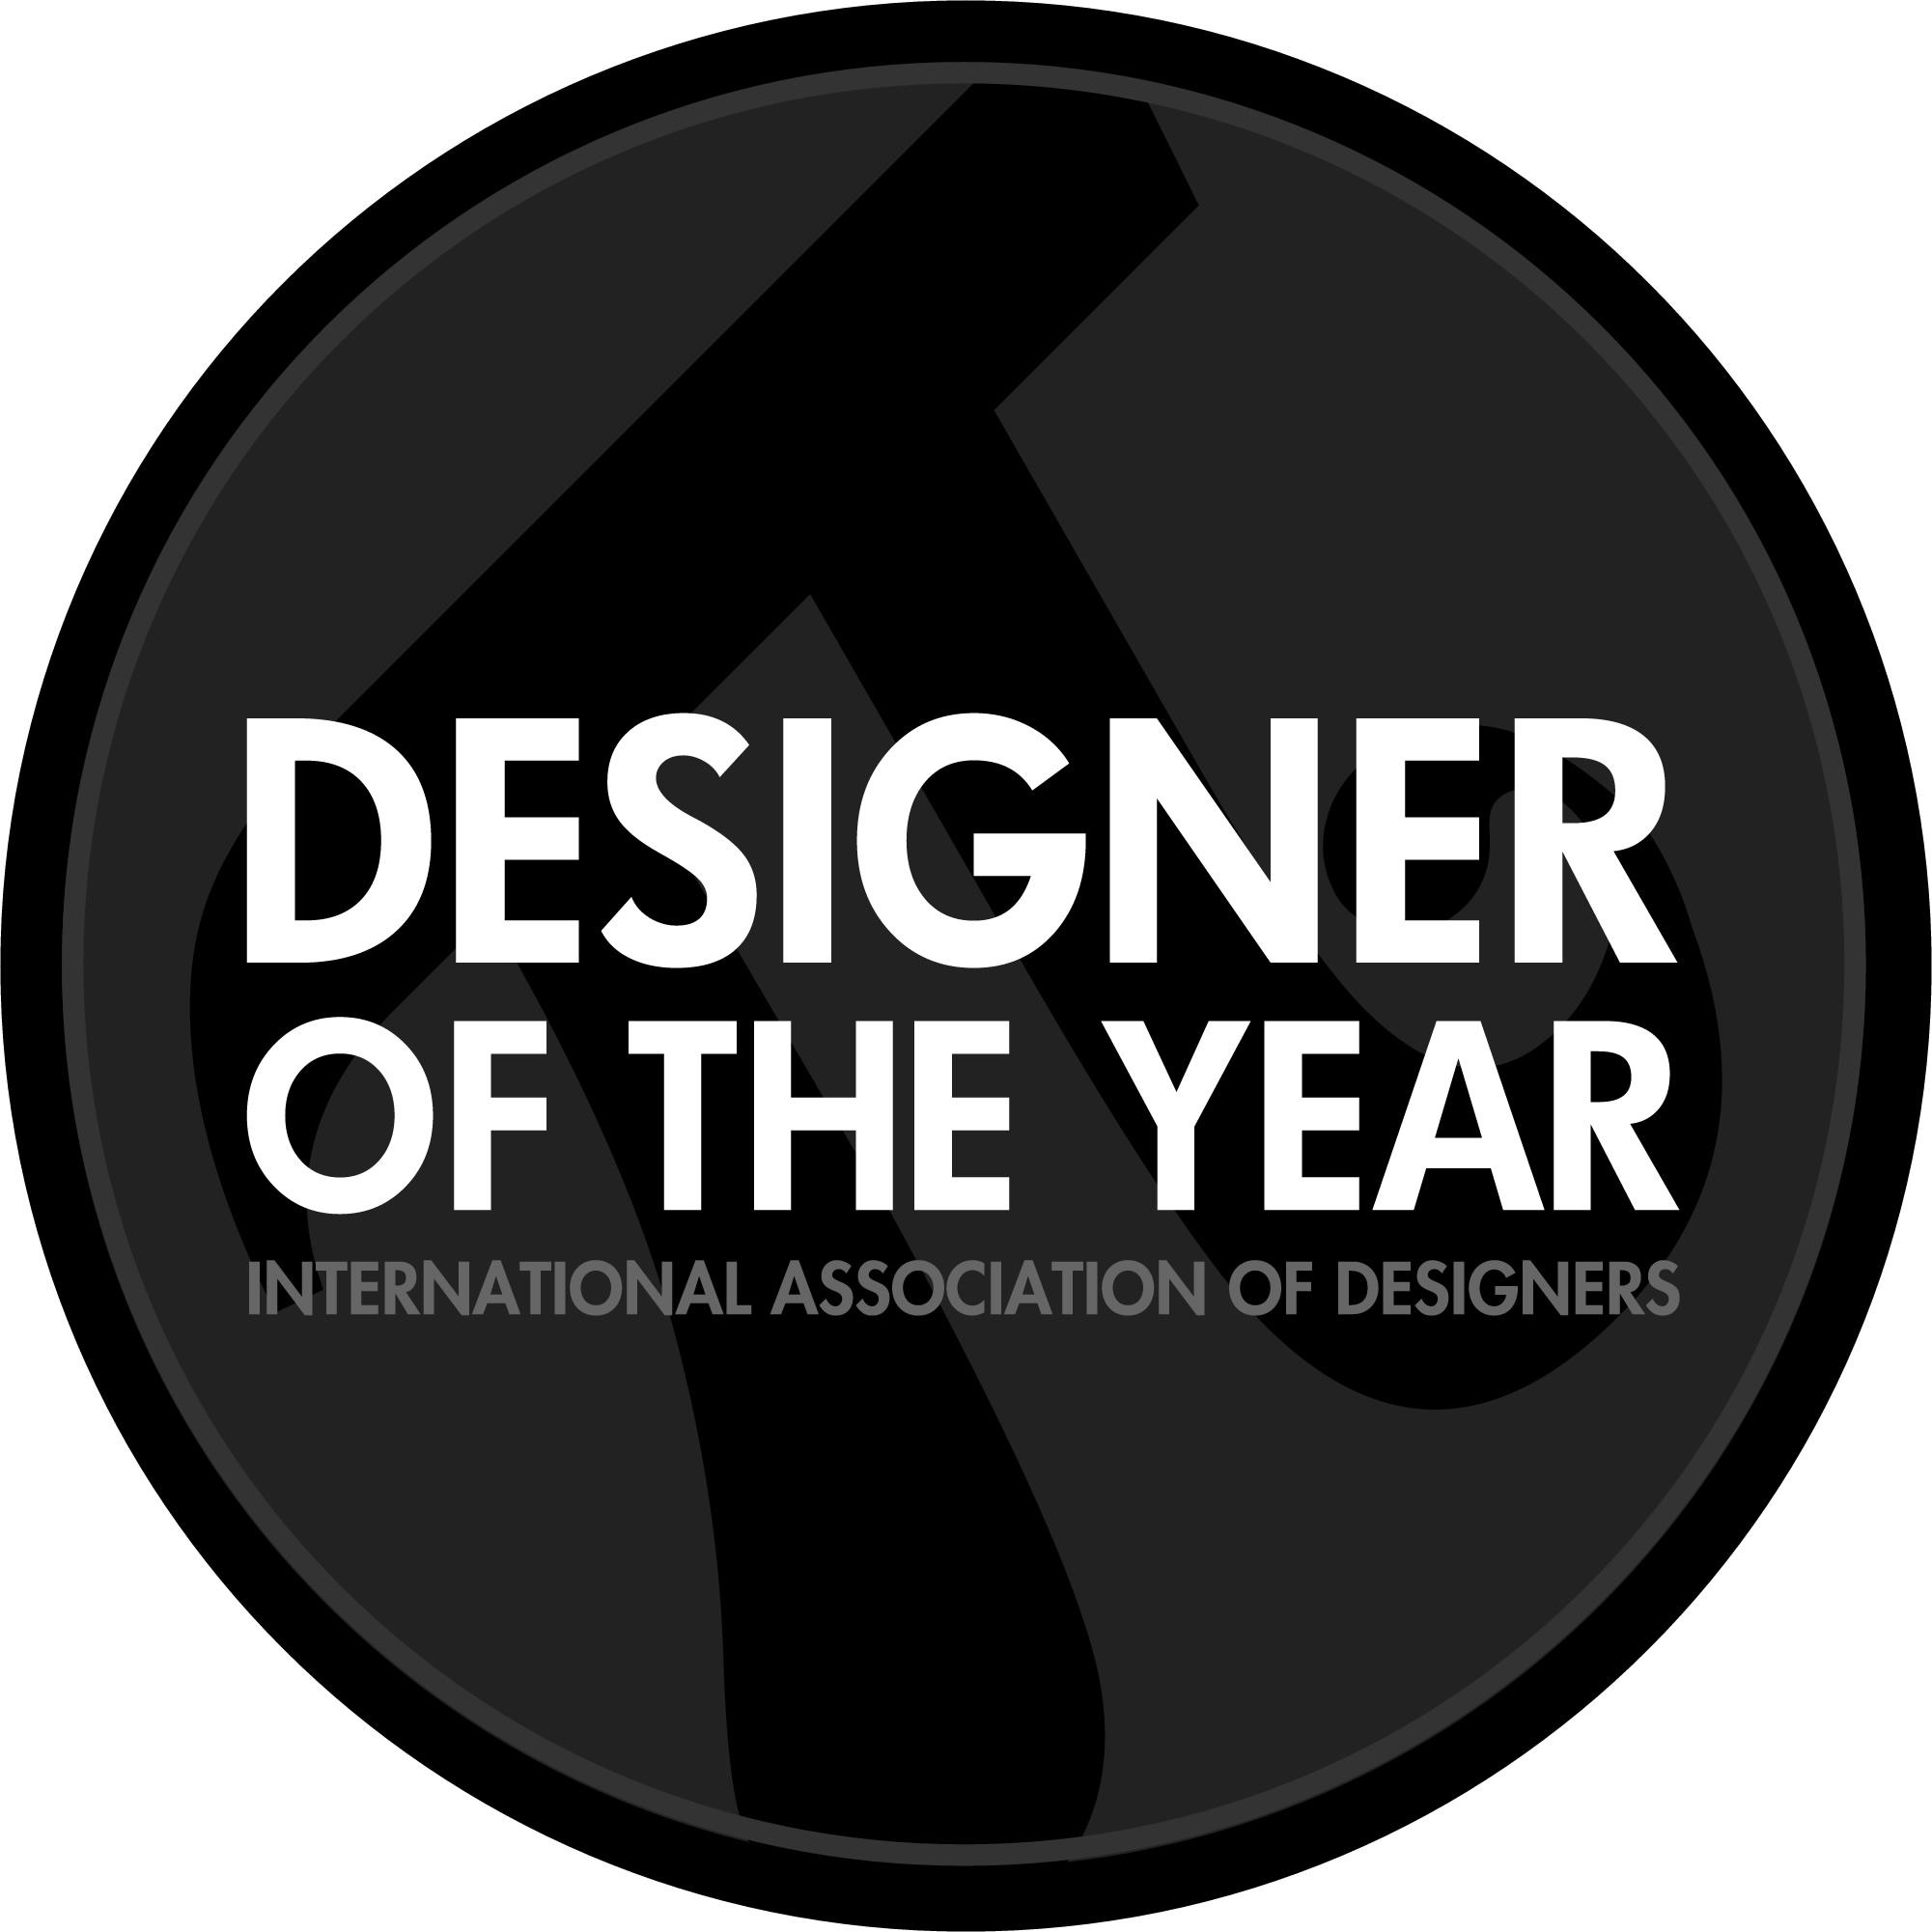 Download Designer of the Year Award Logo. Designer of the Year